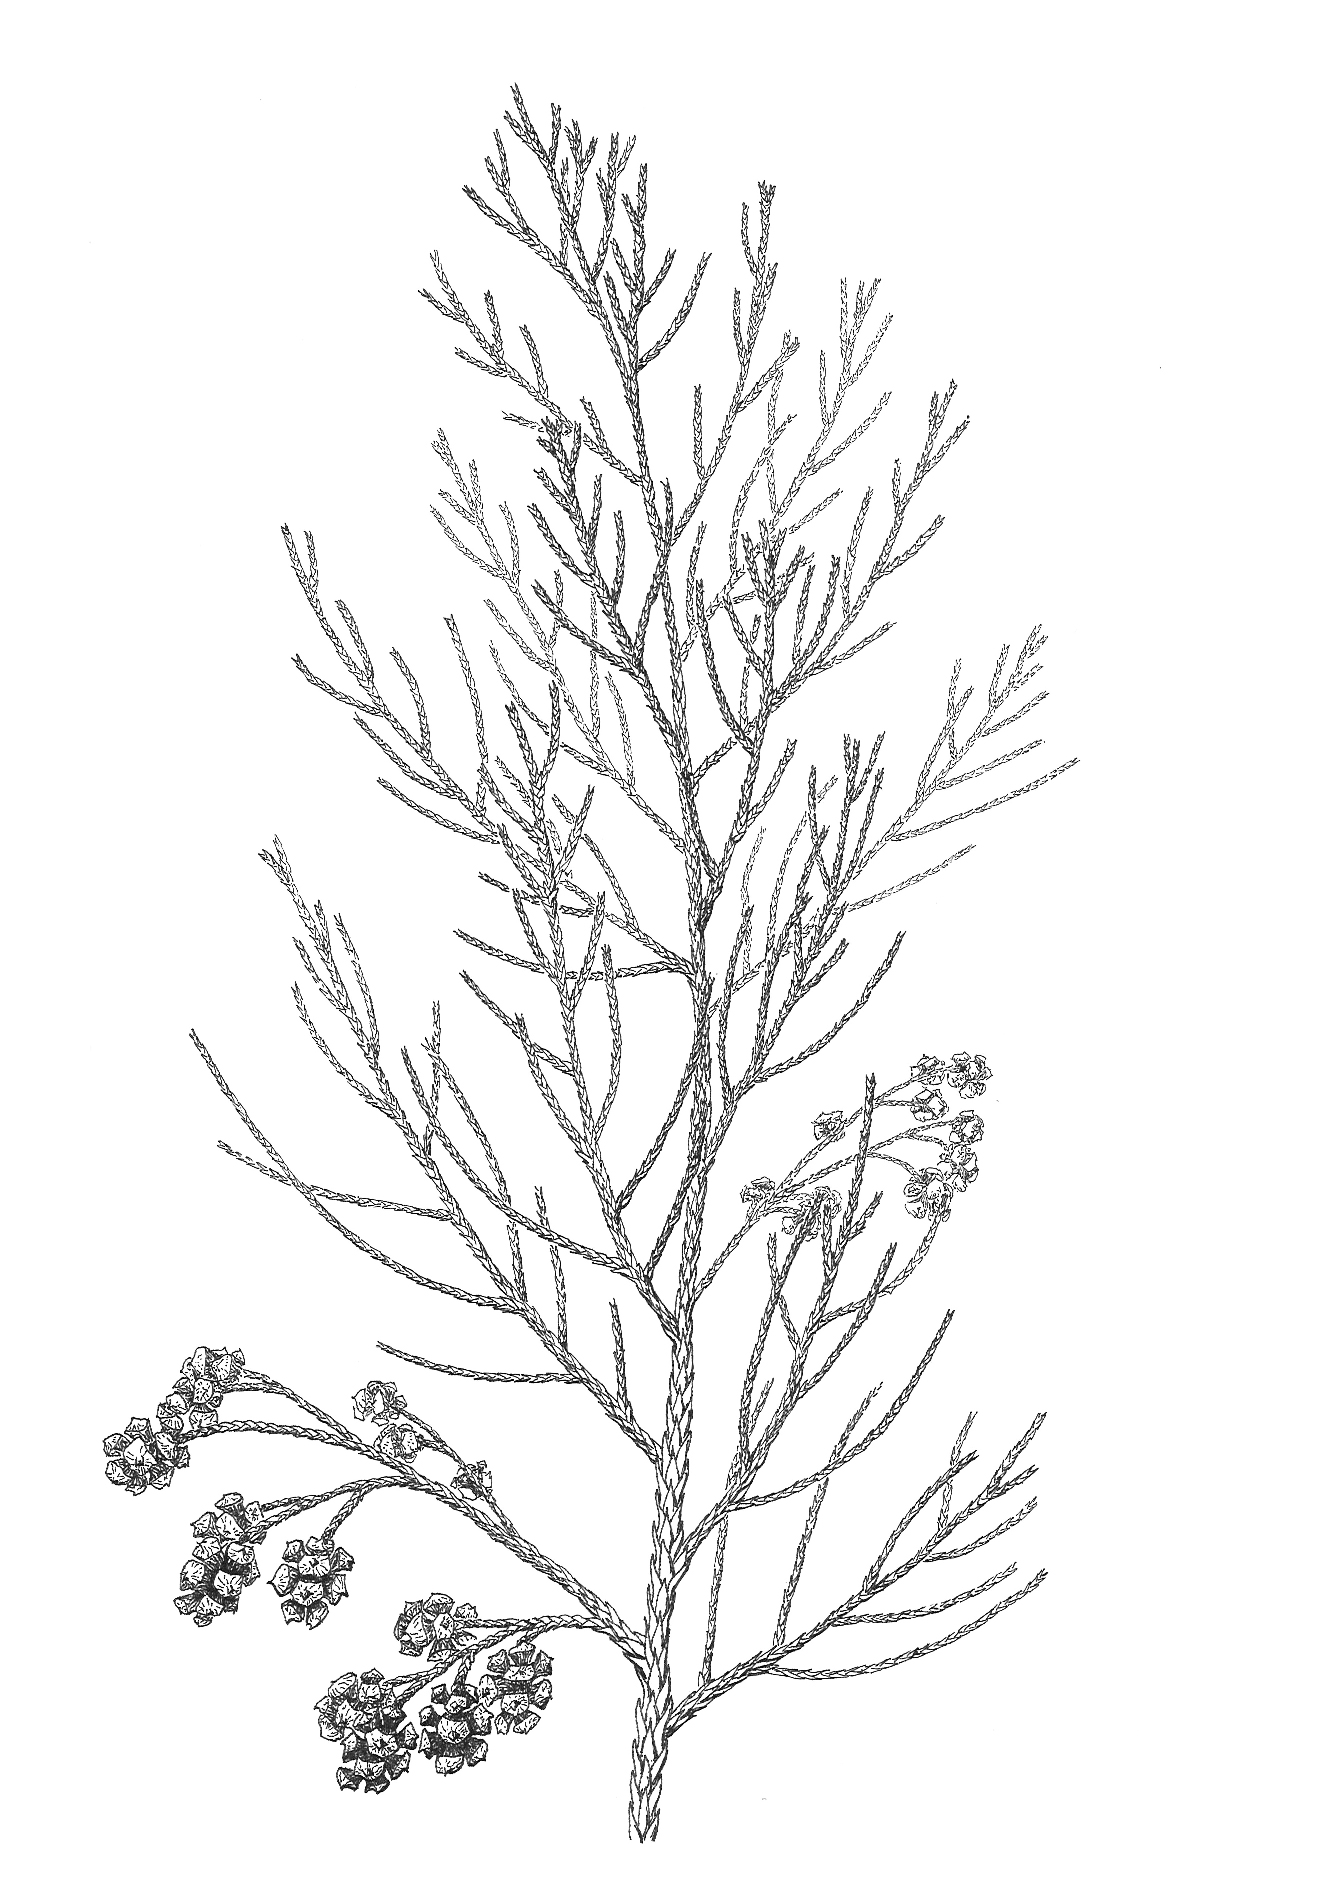 Sphenolepis